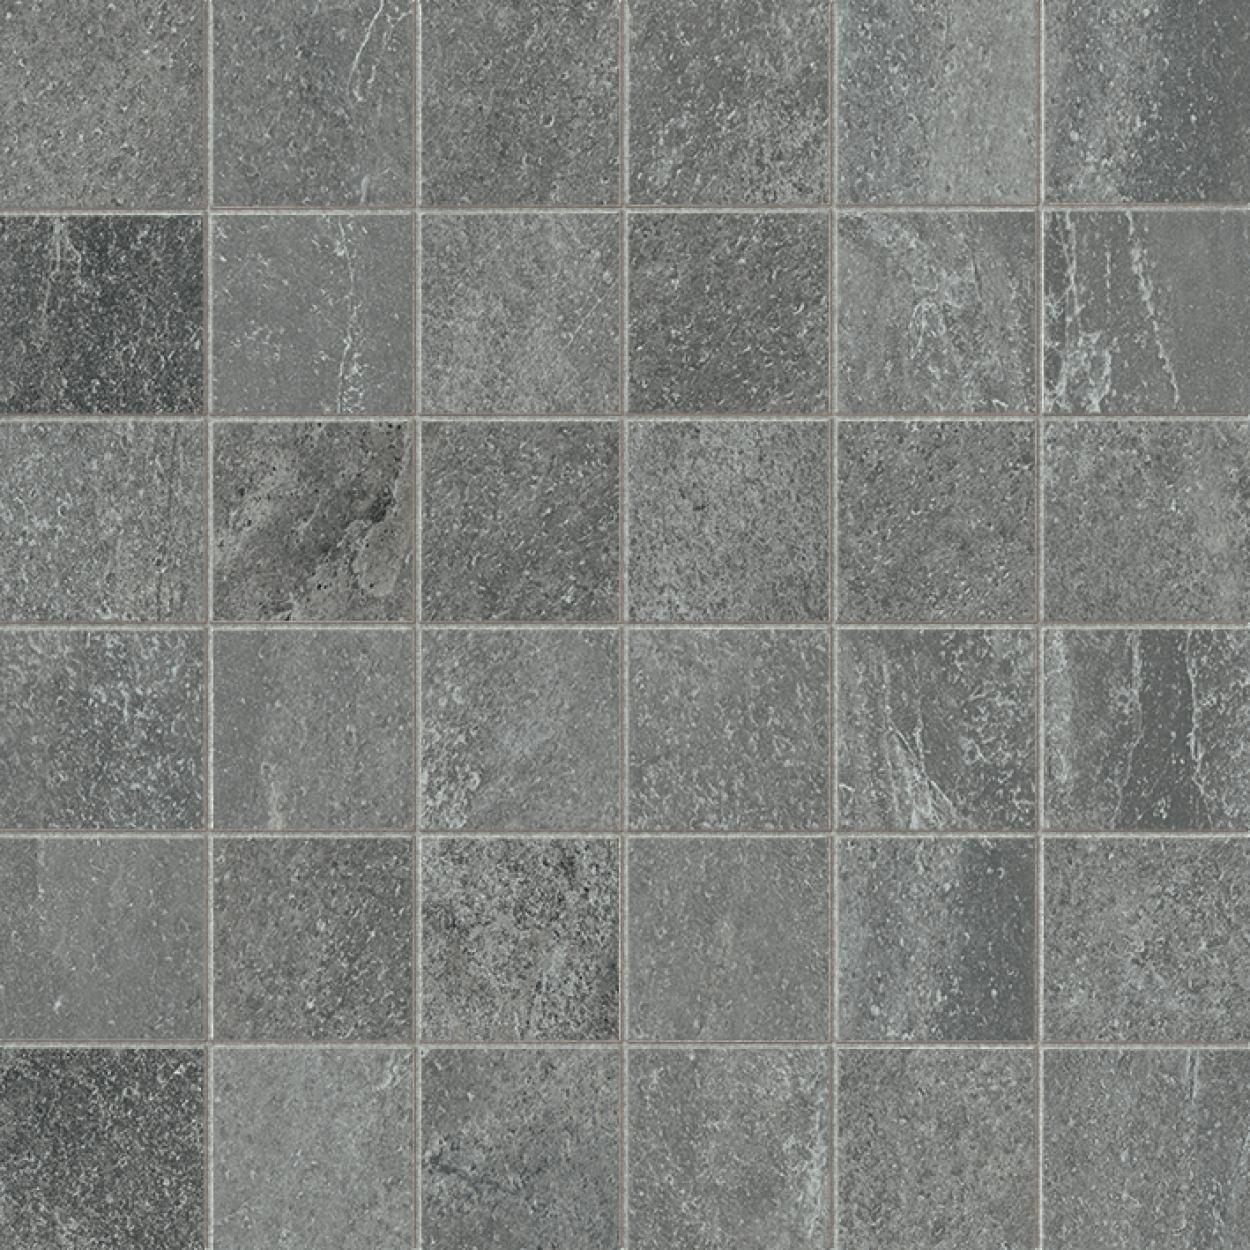 2 x 2 Board Graphite mosaic